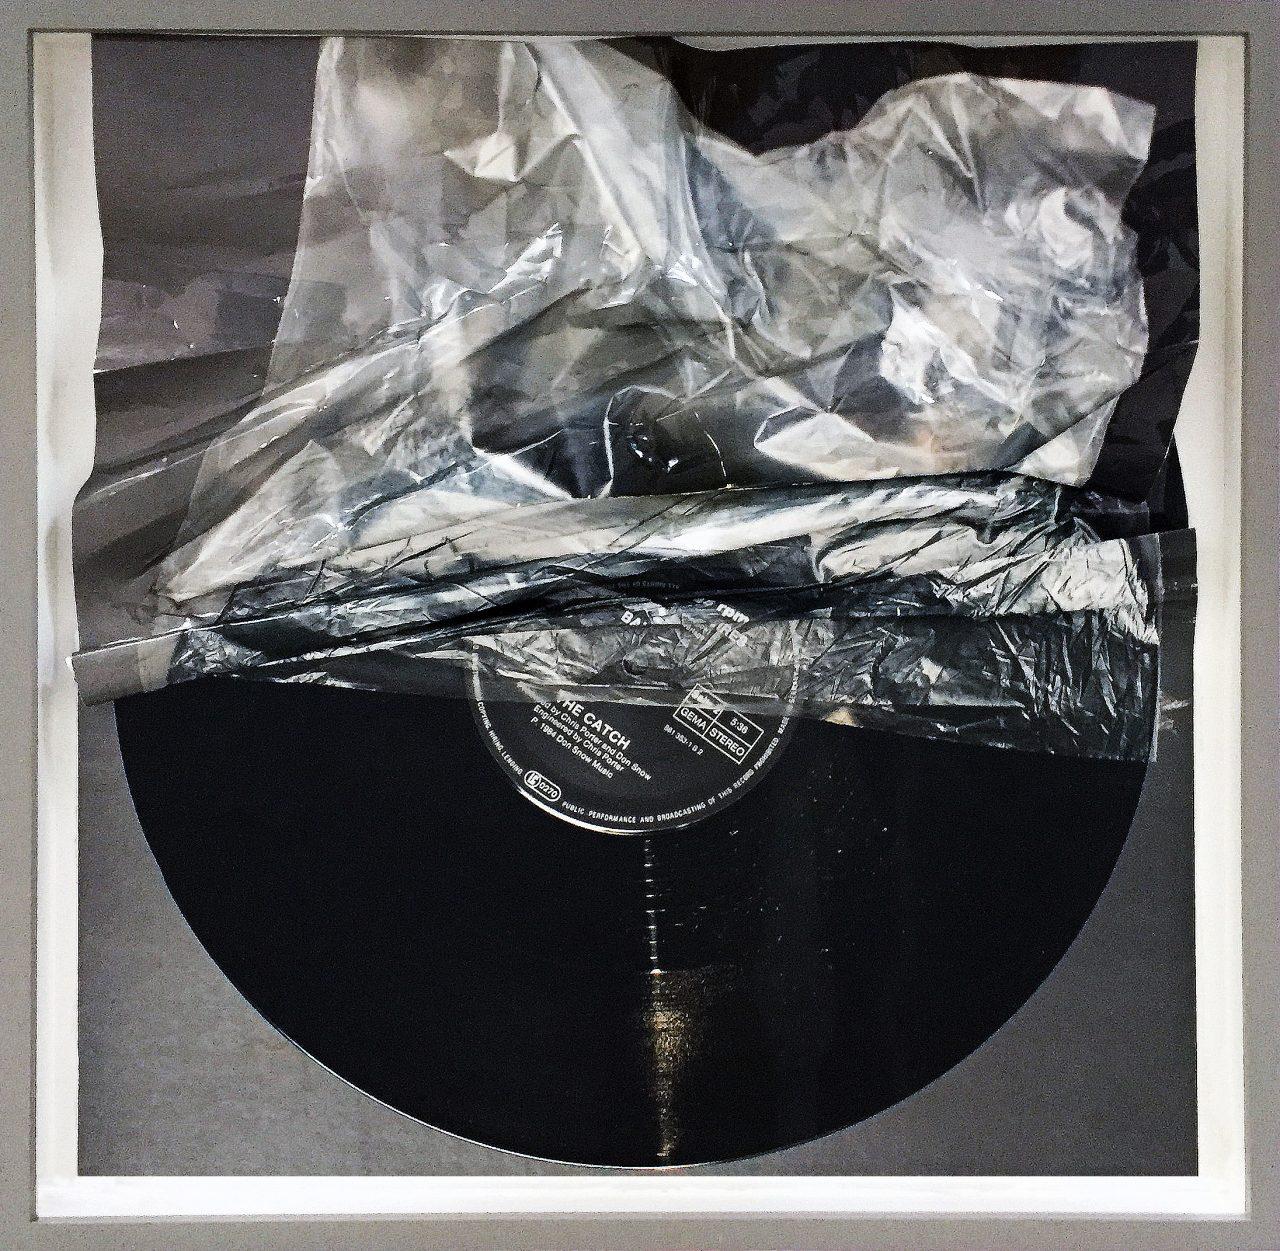 Opere Scelte Gallery from Torino shows Berlin Artists ………….. Hoischen / Mark…….. image